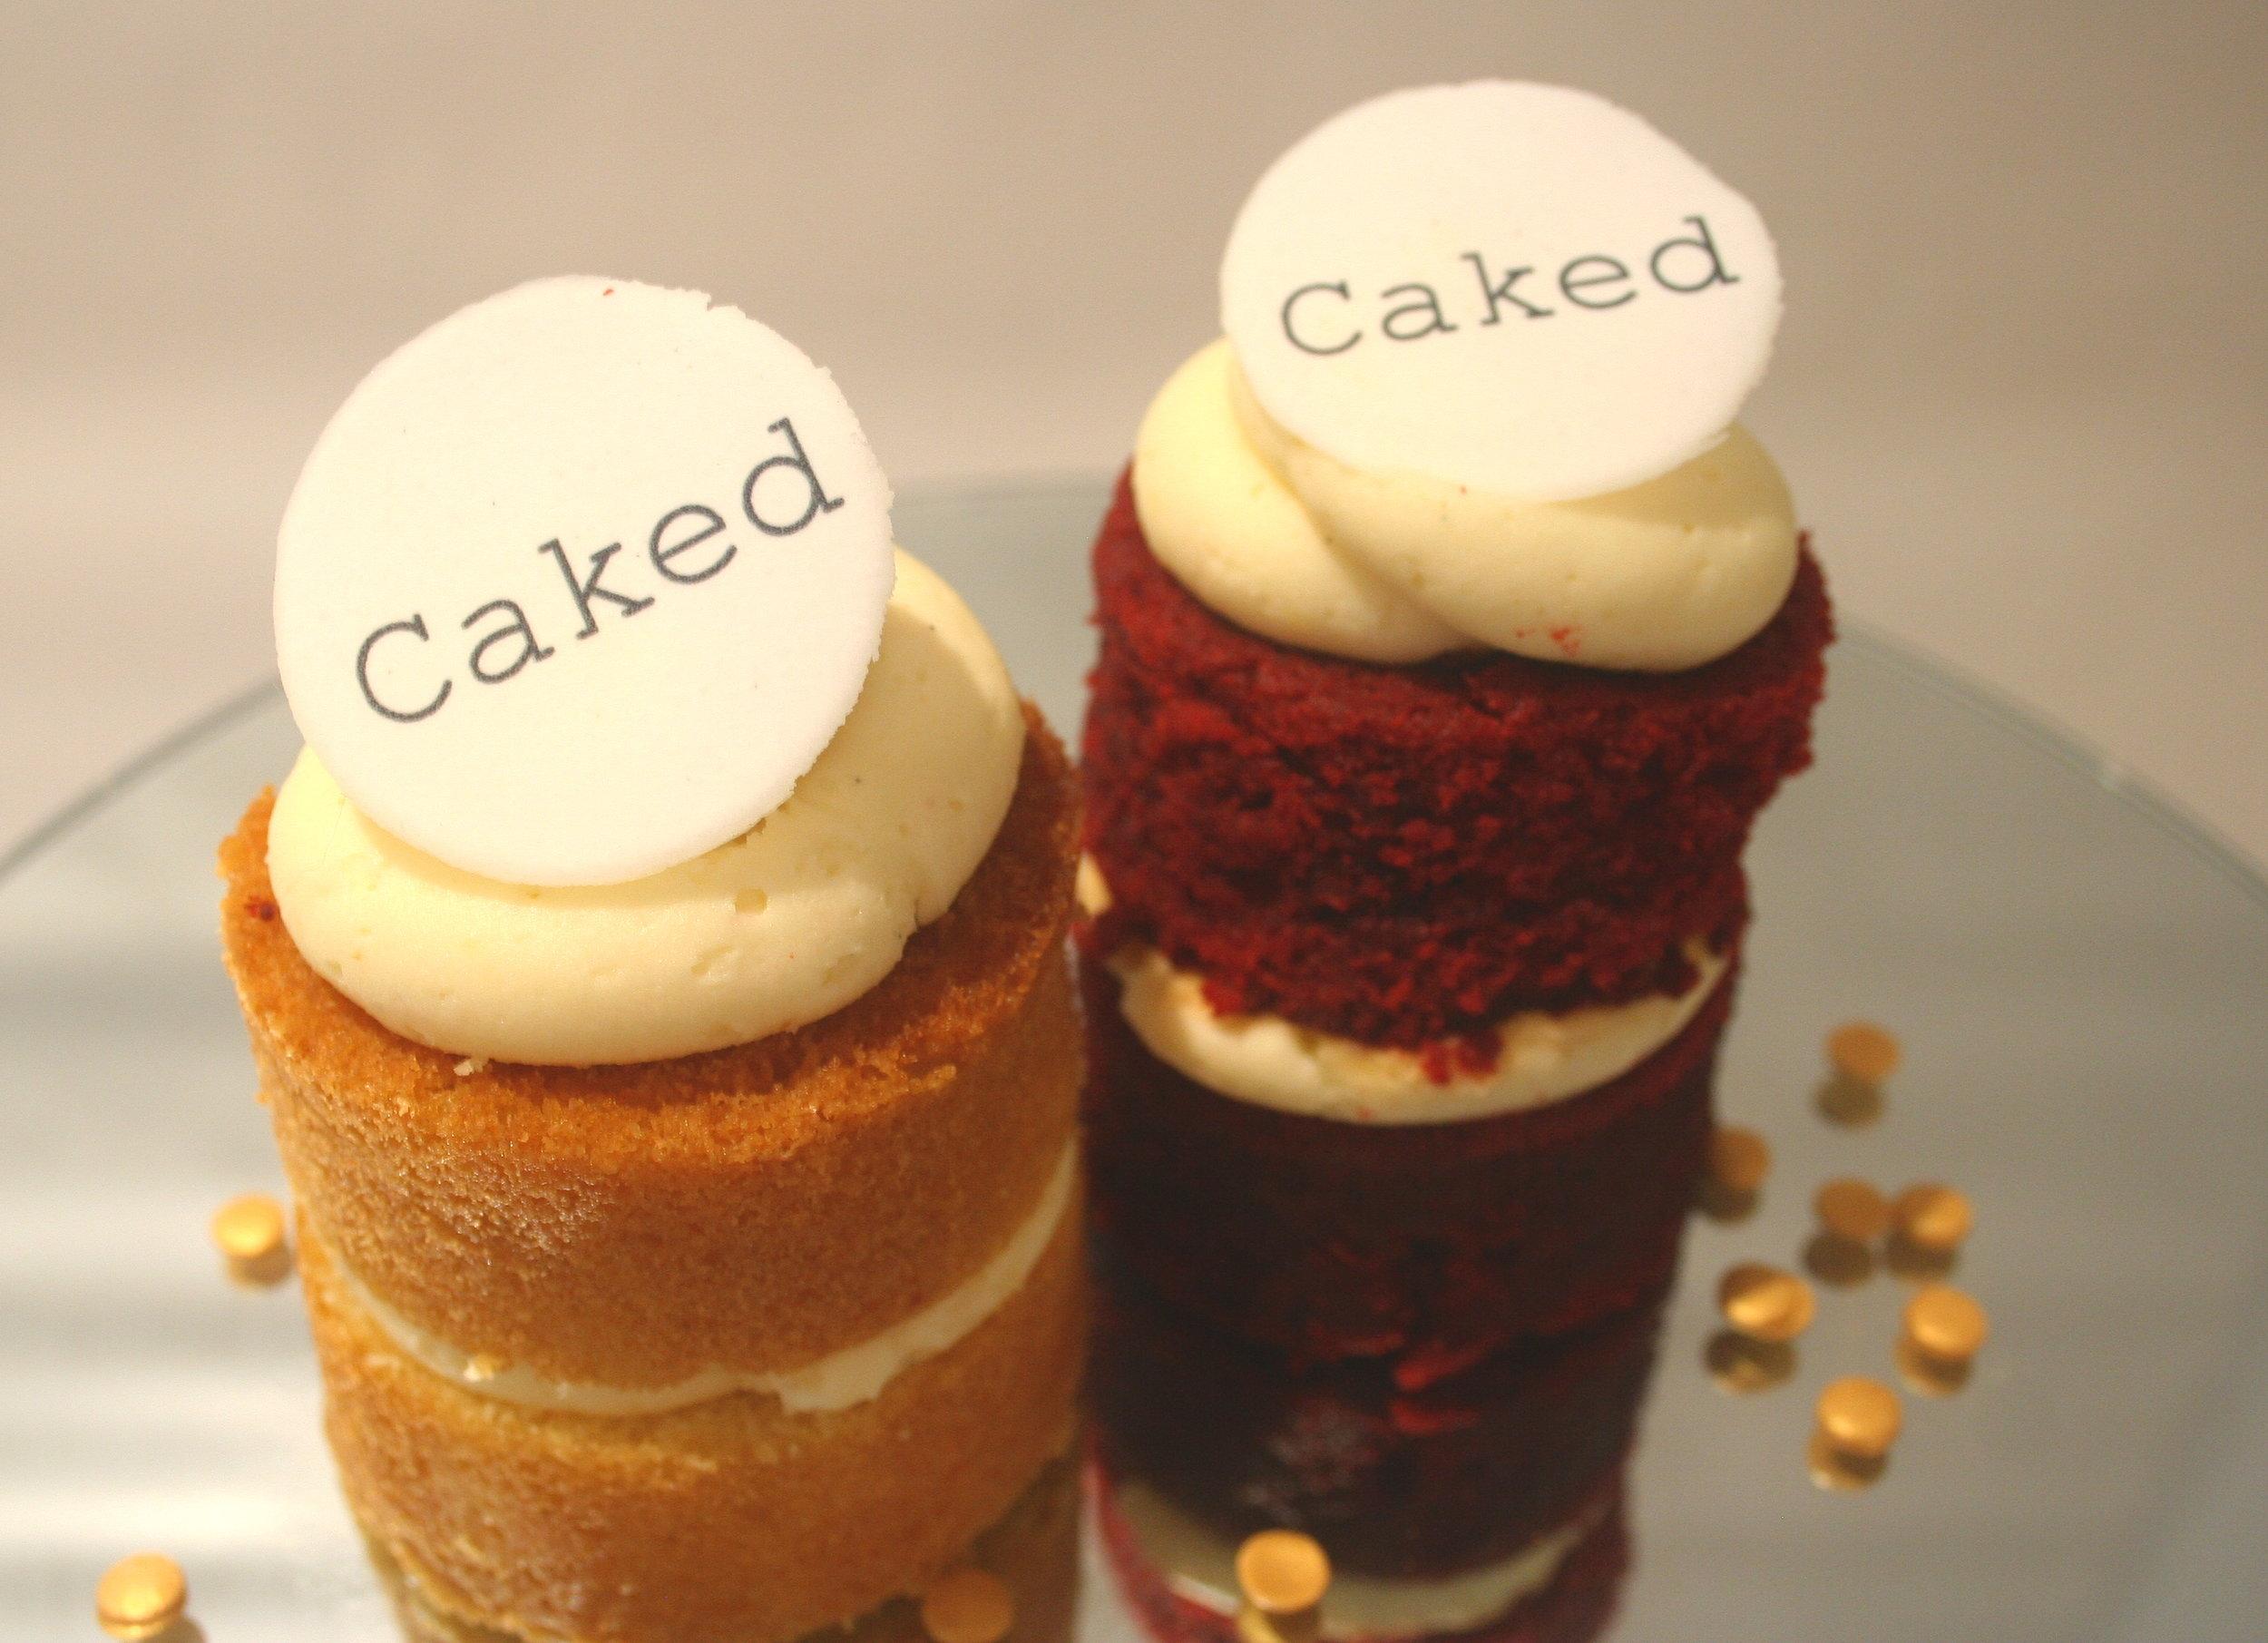 Caked Branded Mini Cakes